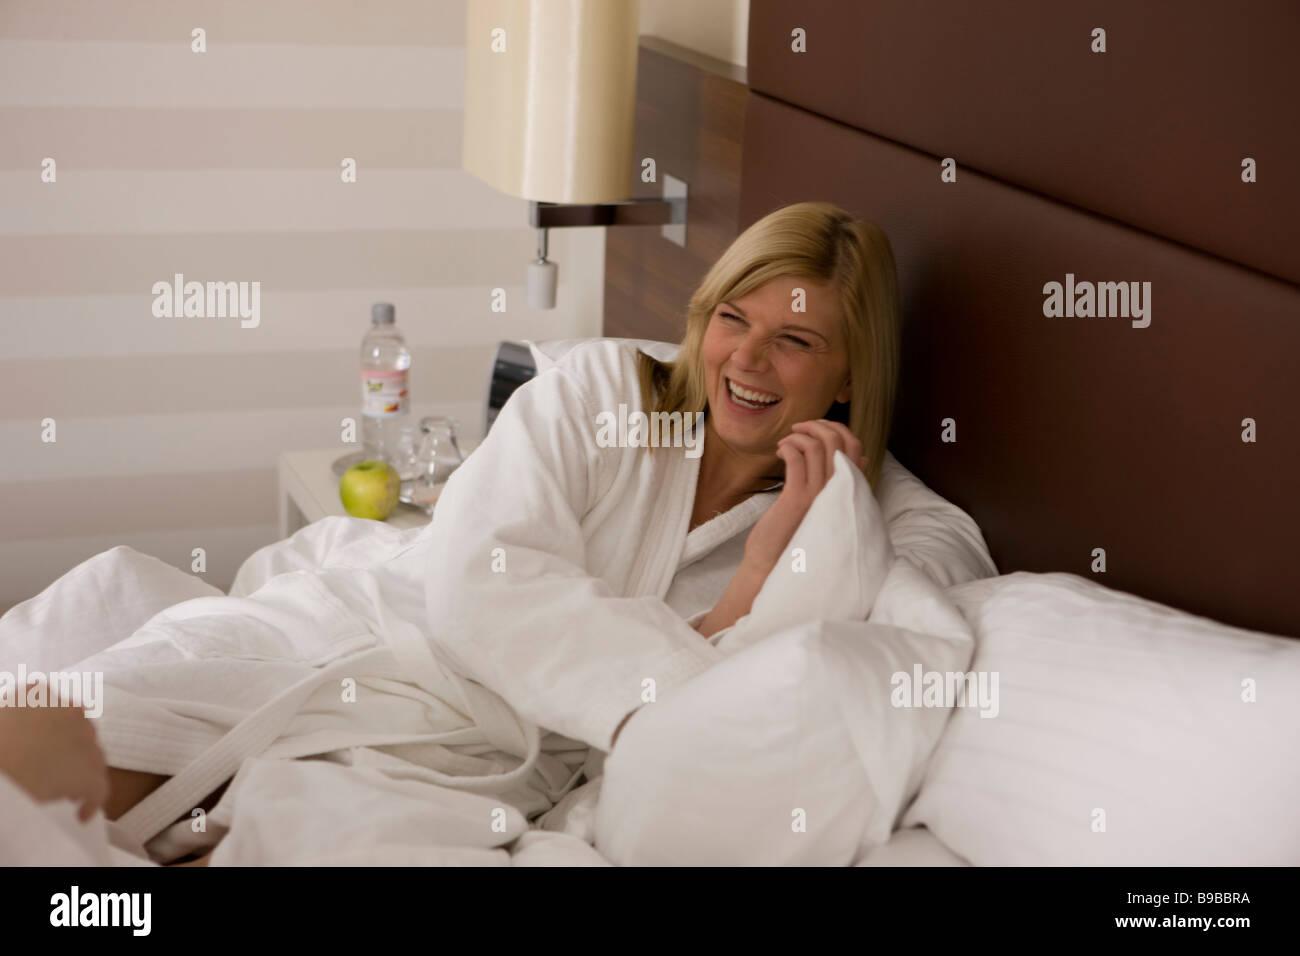 frau liegt lachend im bademantel auf dem bett Stock Photo